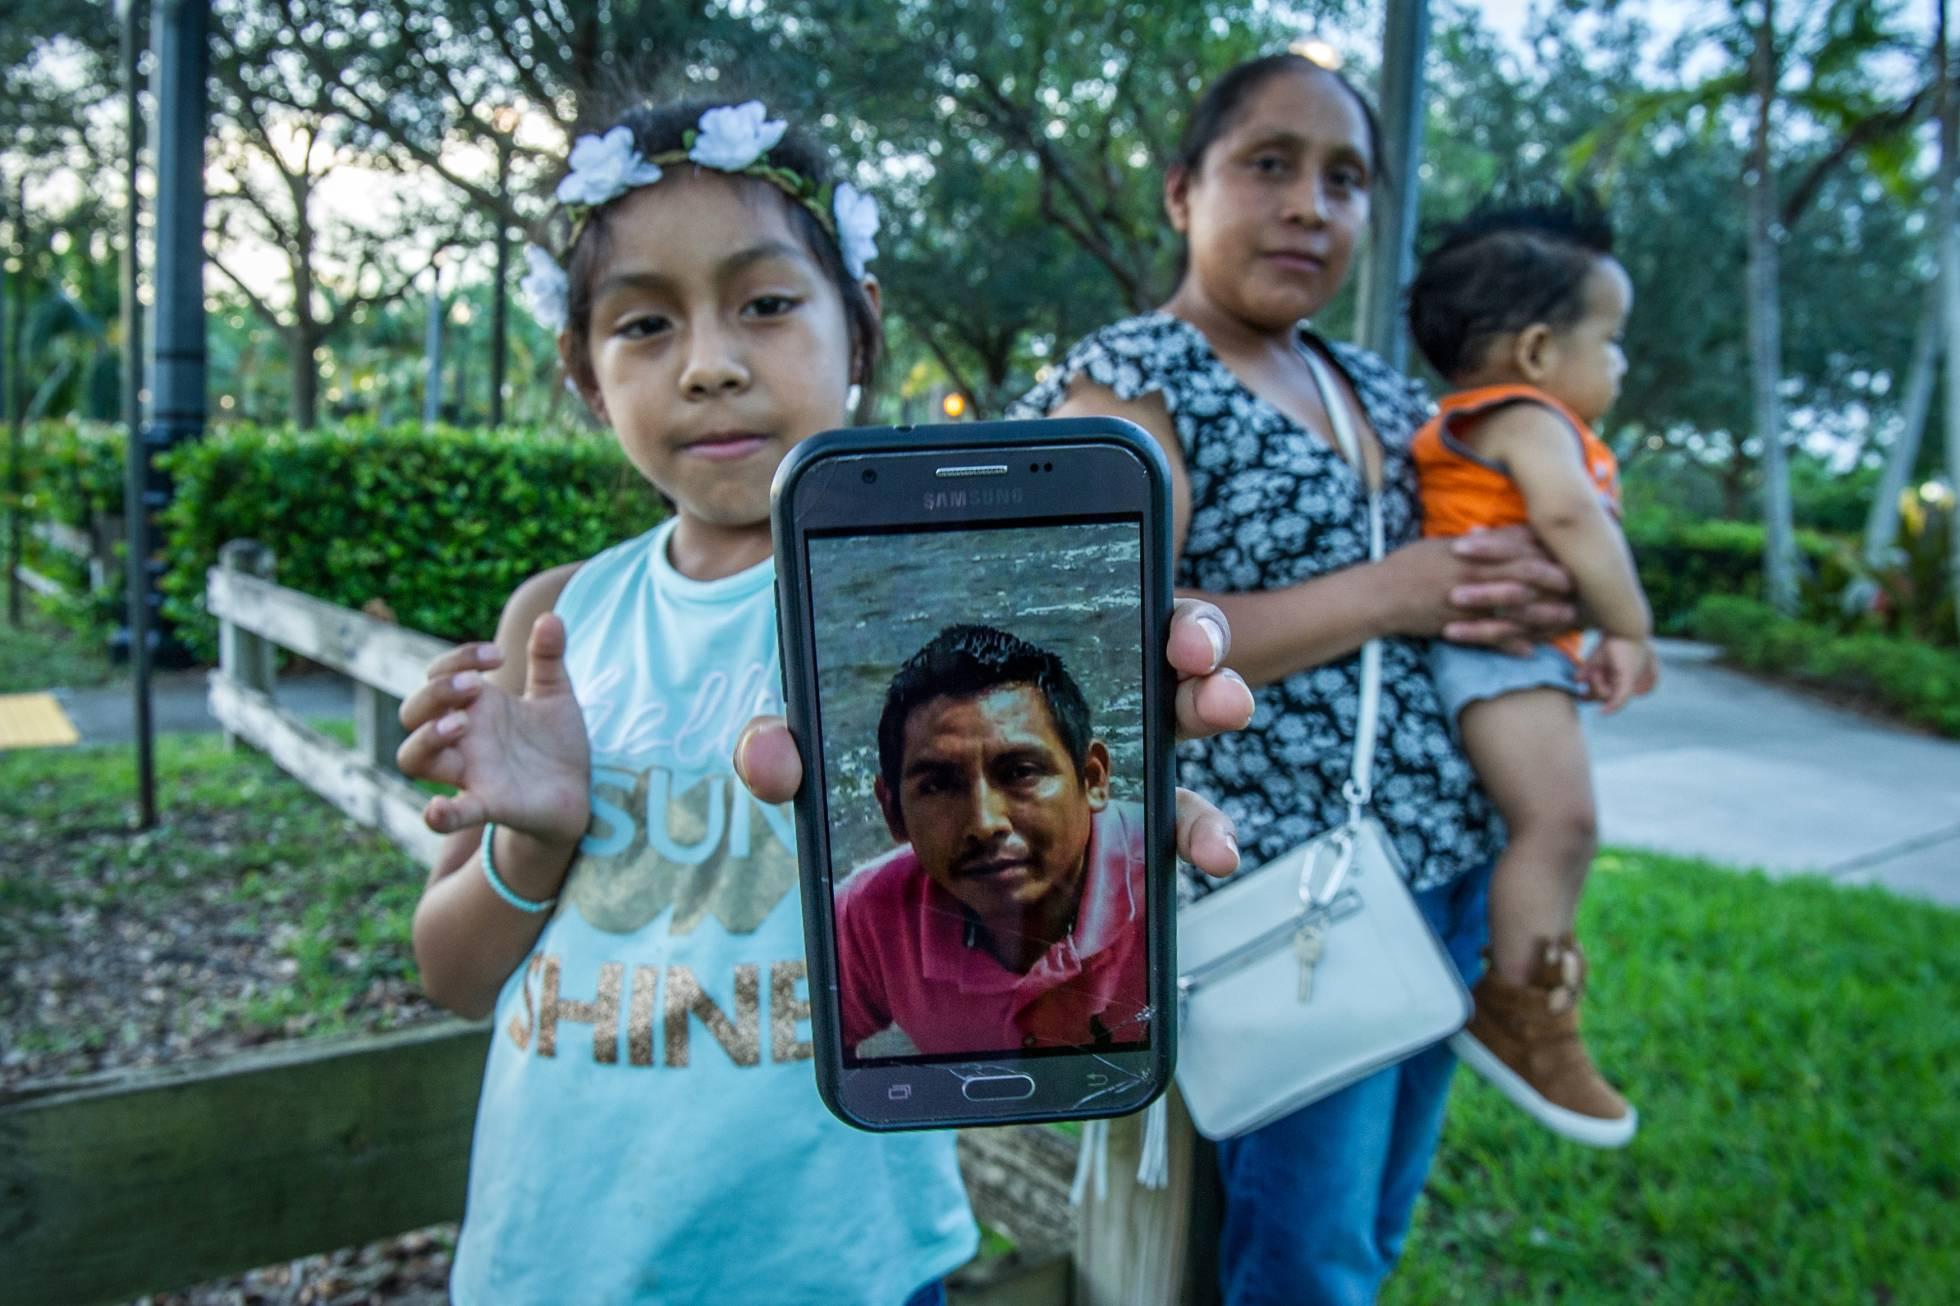 Una familia rota por la 'tolerancia cero' de EE UU